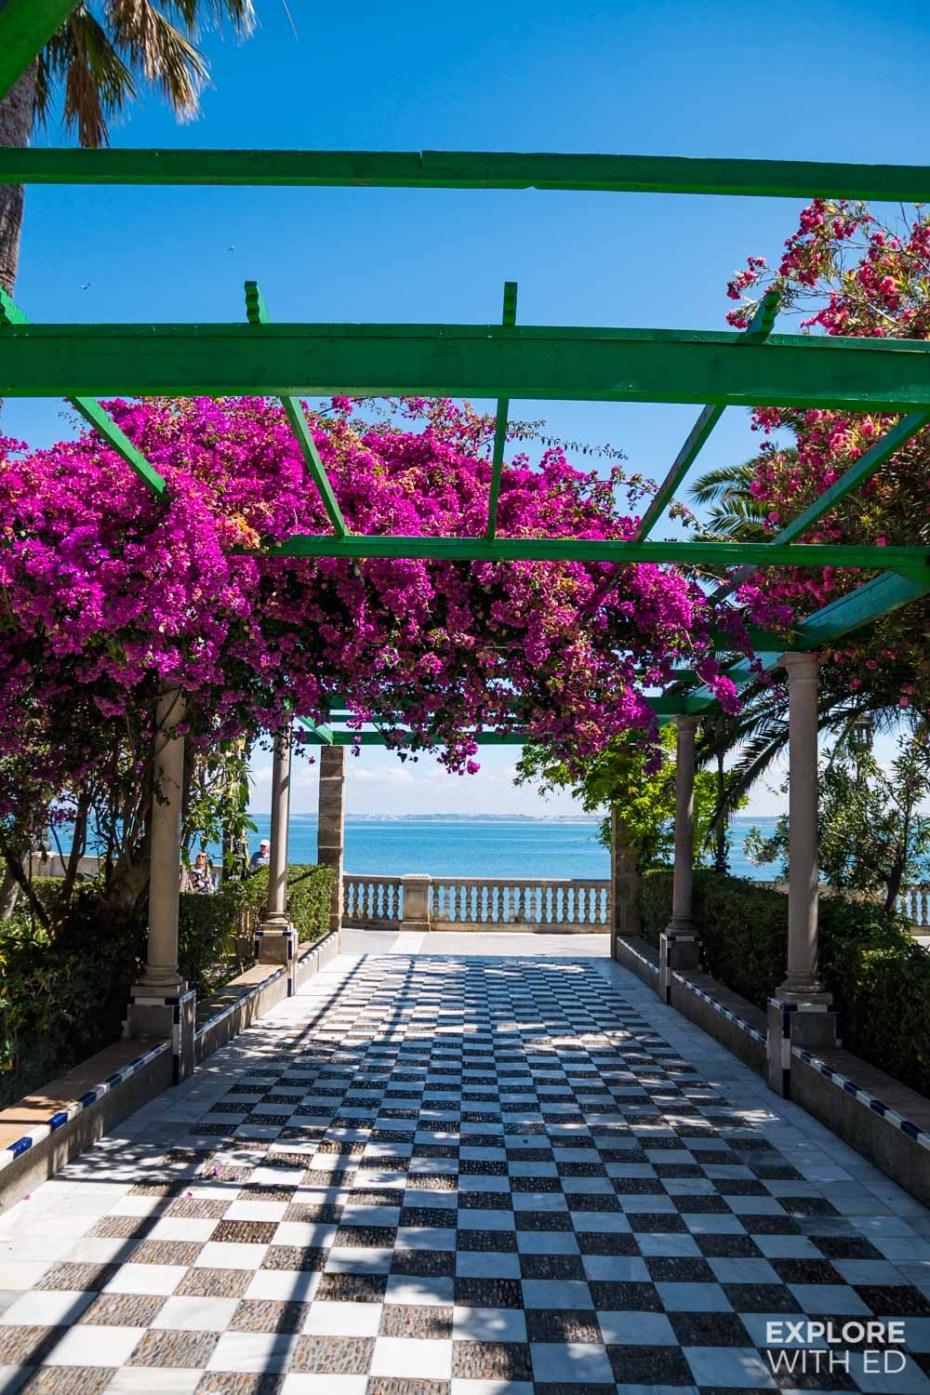 Walking tour of Cadiz through the gardens of Alameda Apodaca